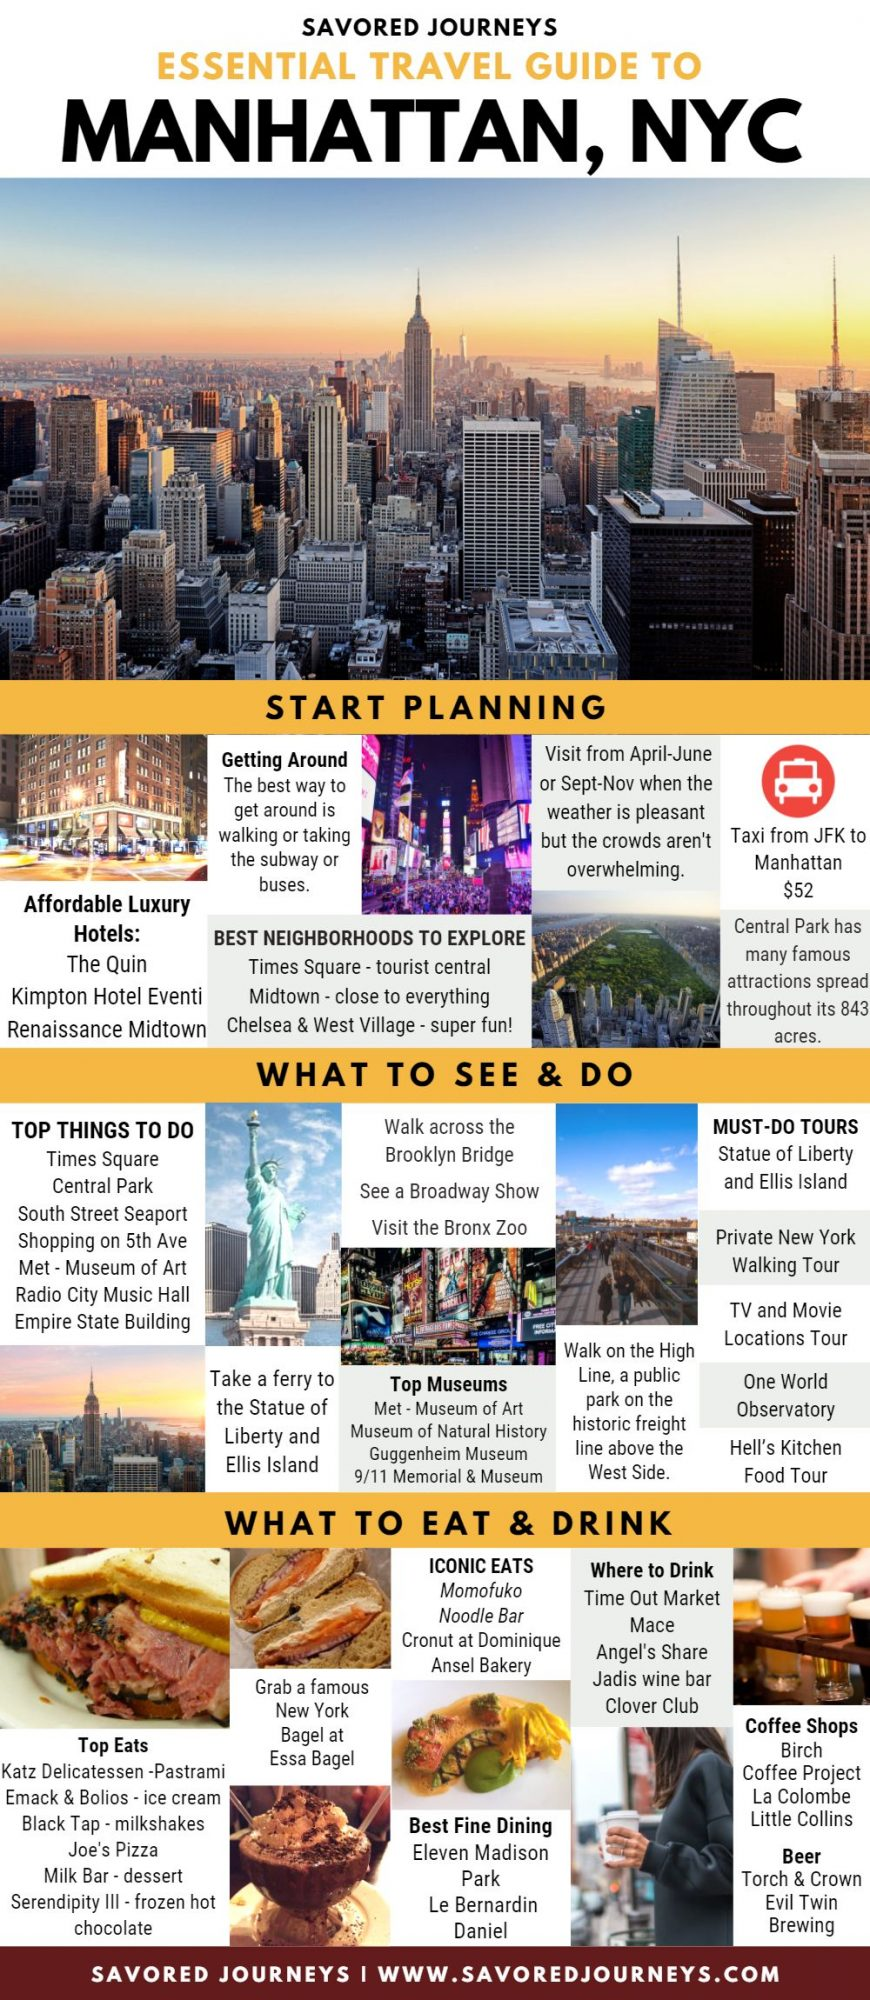 essential travel guide to manhattan